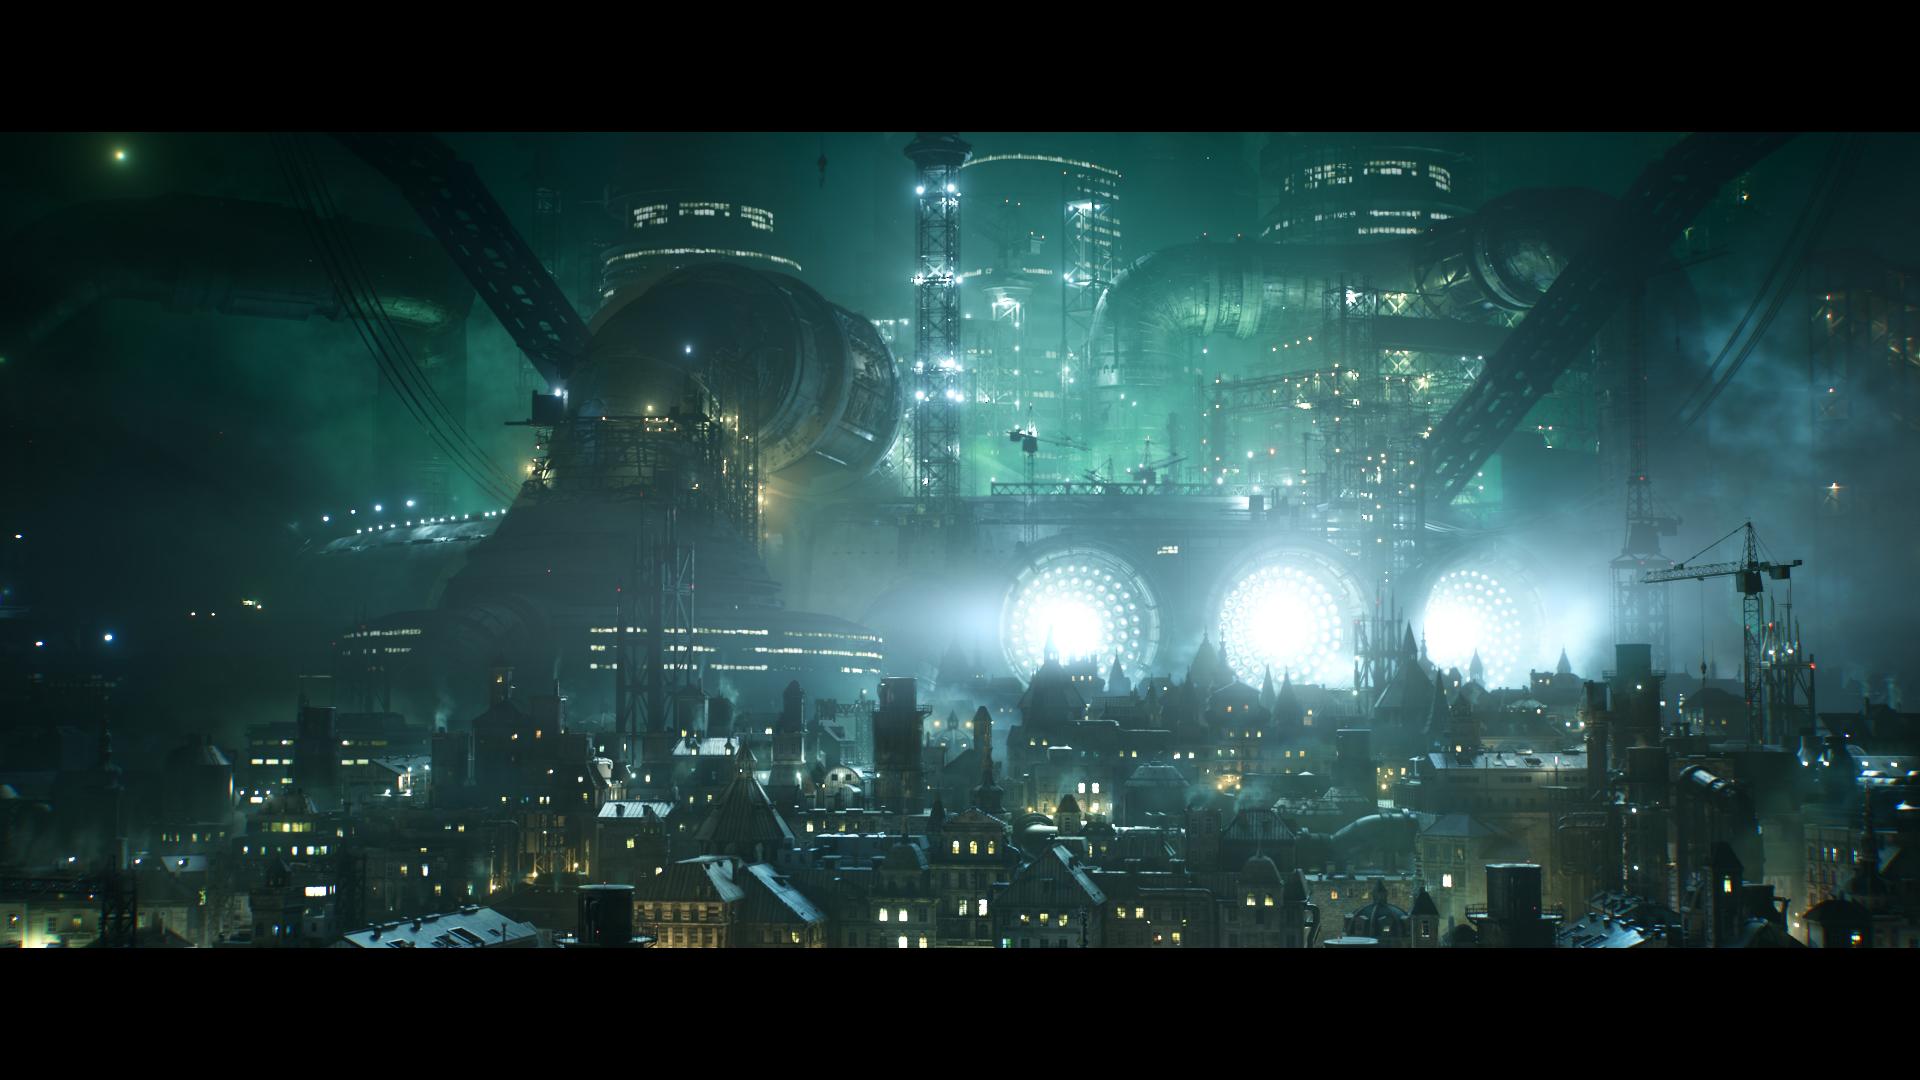 [E3 SURREAL] Final Fantasy VII Remake! Ffvii-remke1